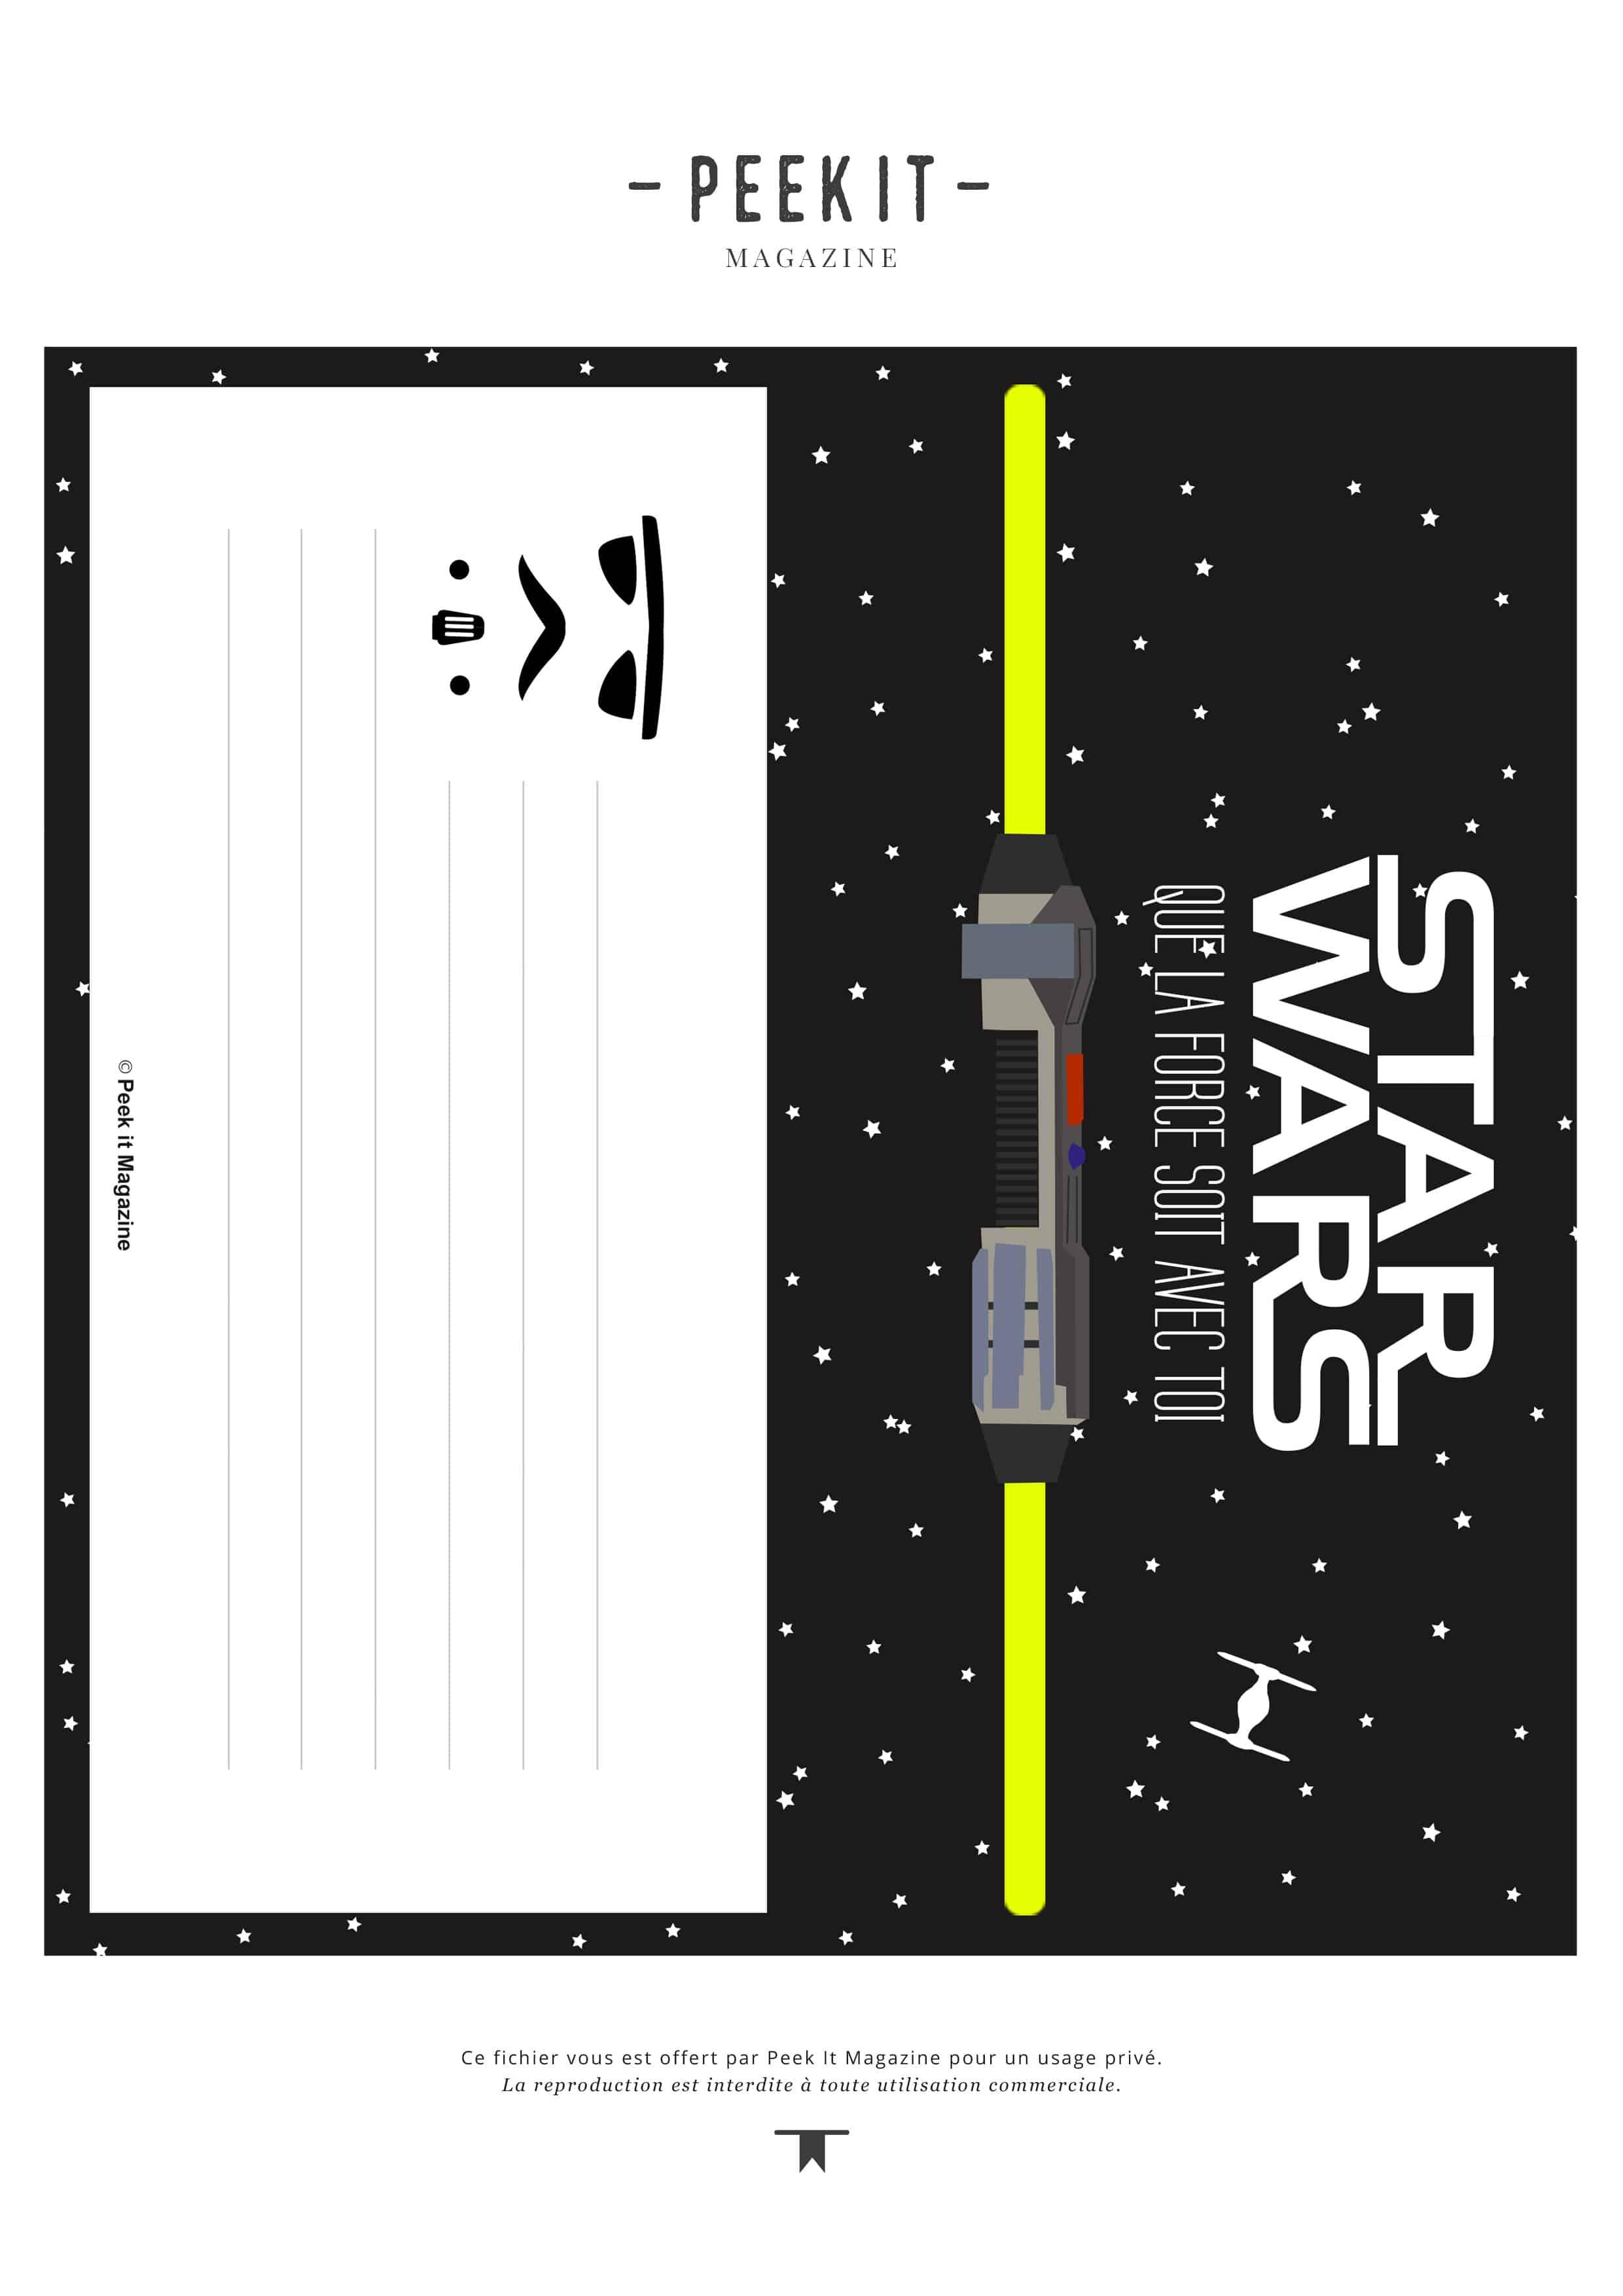 invitation star wars peekitmagazine